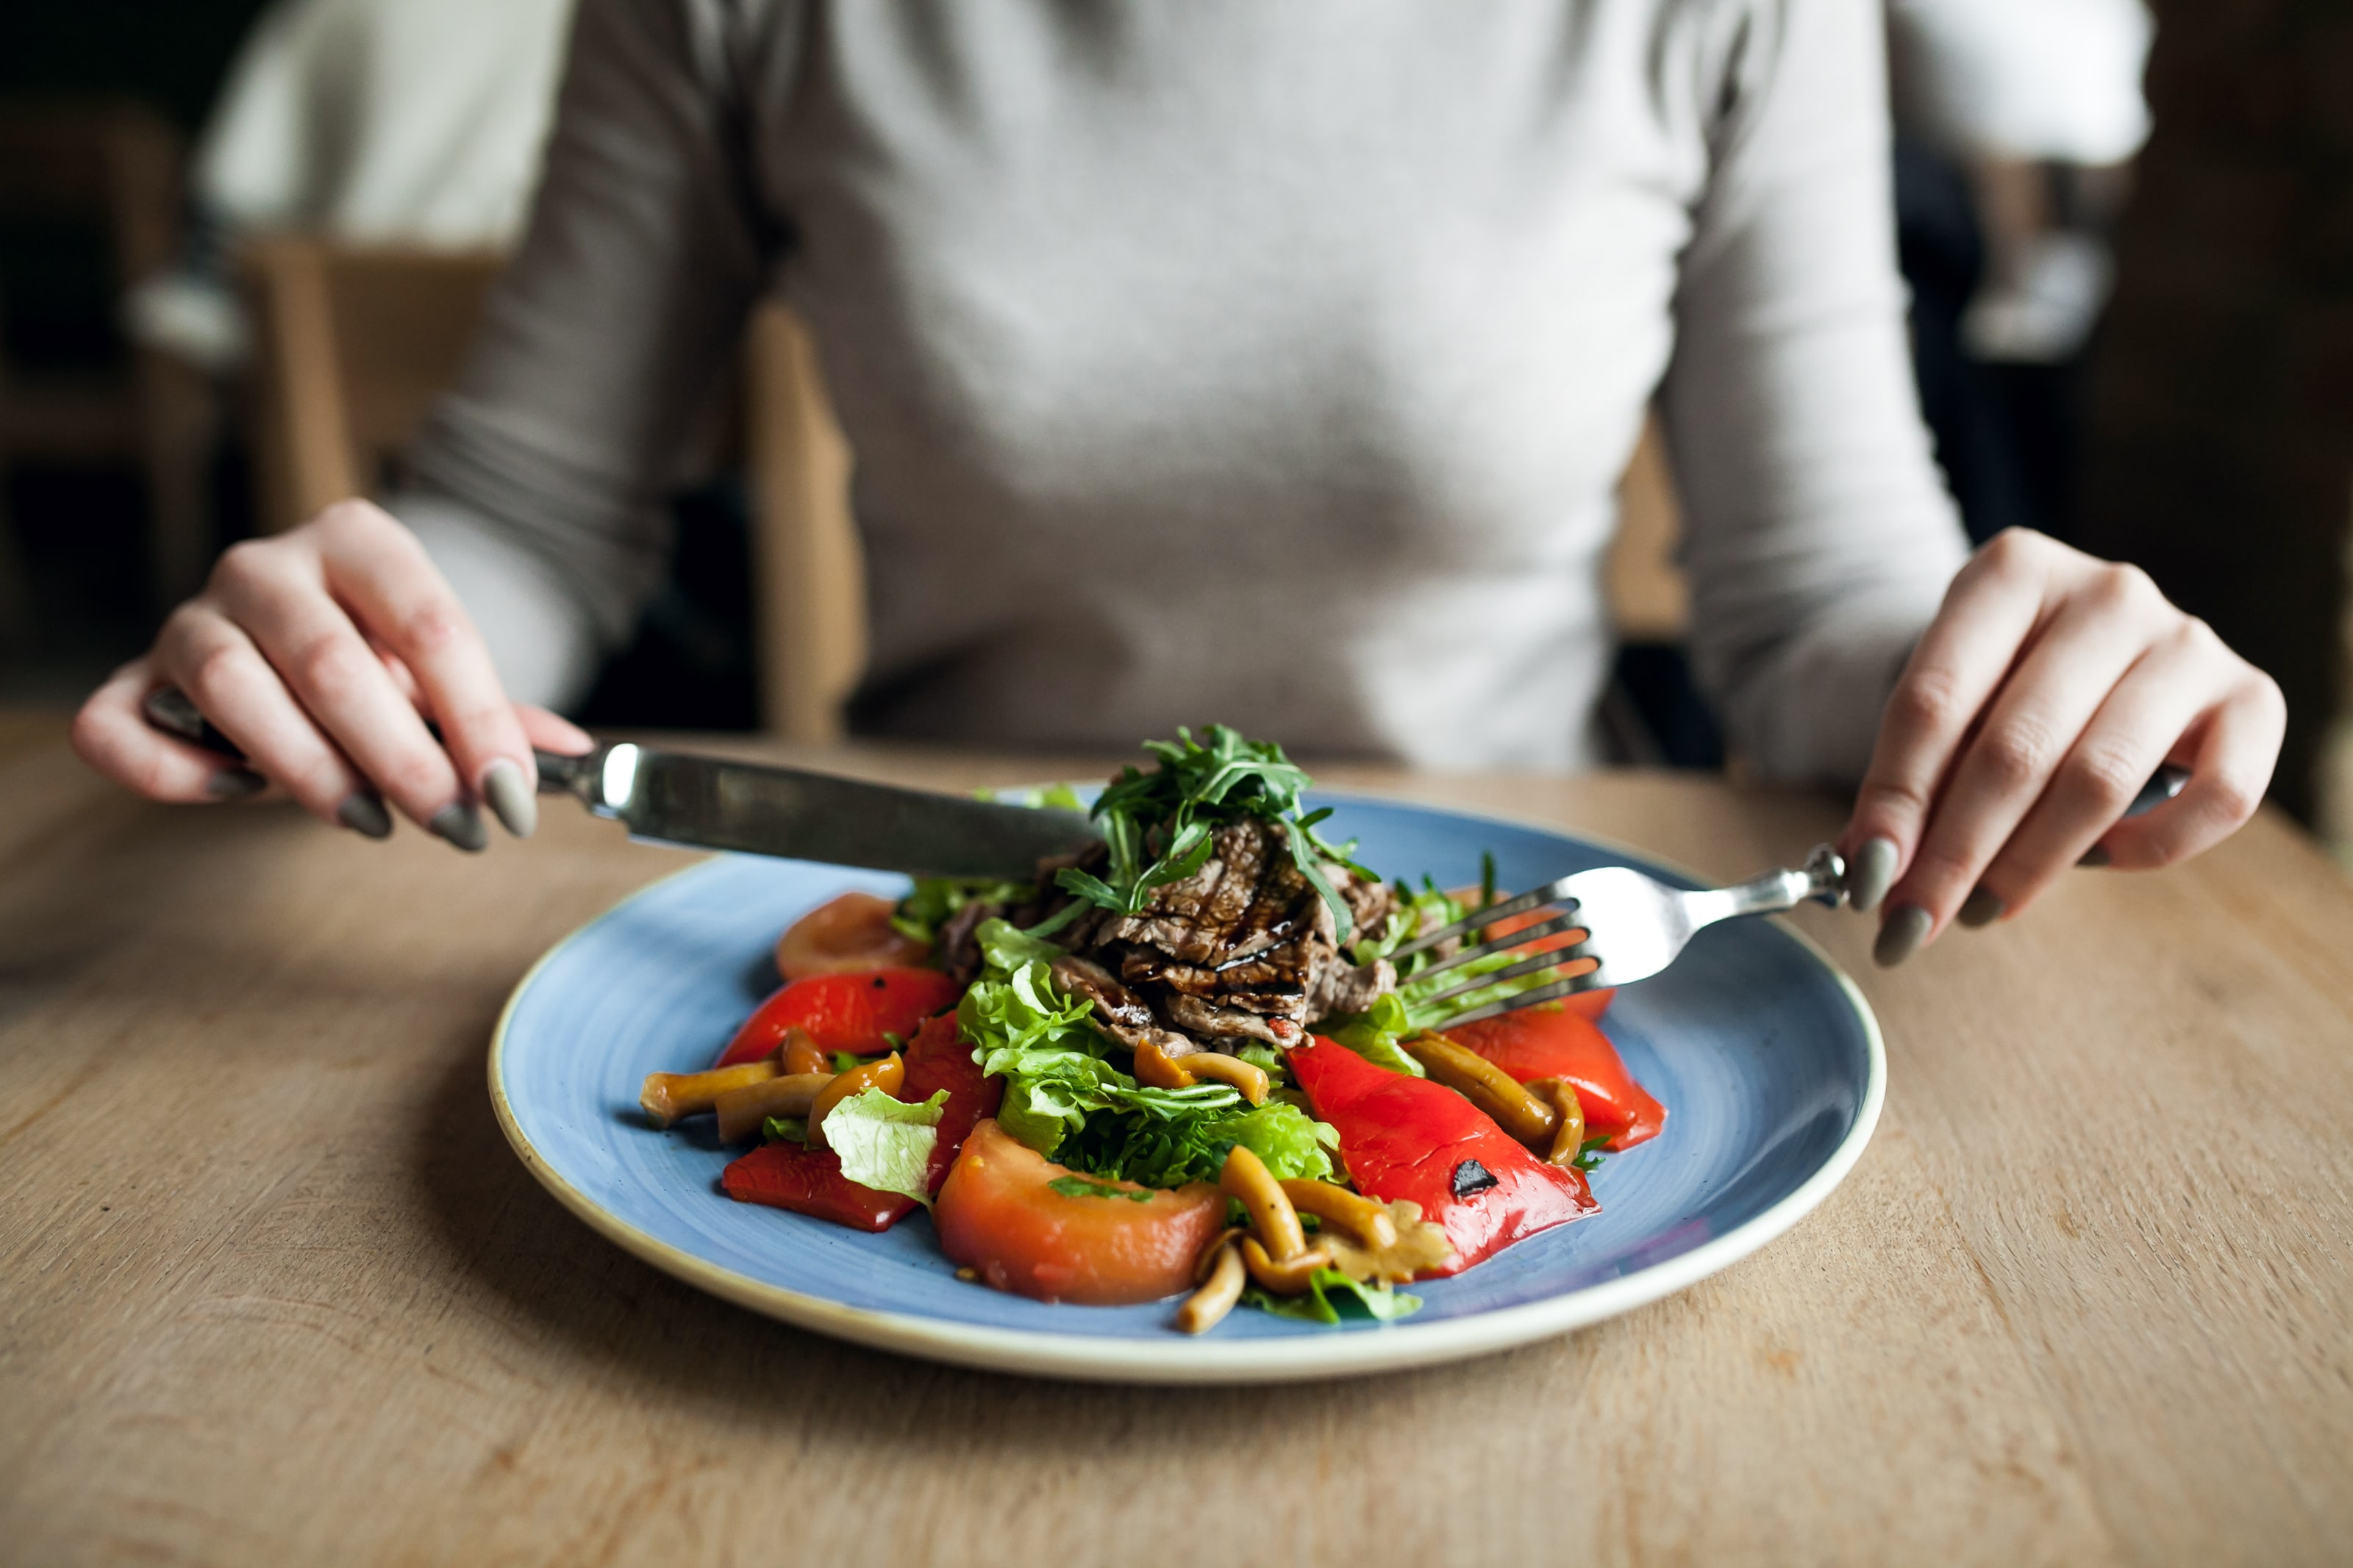 Slow Food: O Alimento Bom, Limpo e Justo